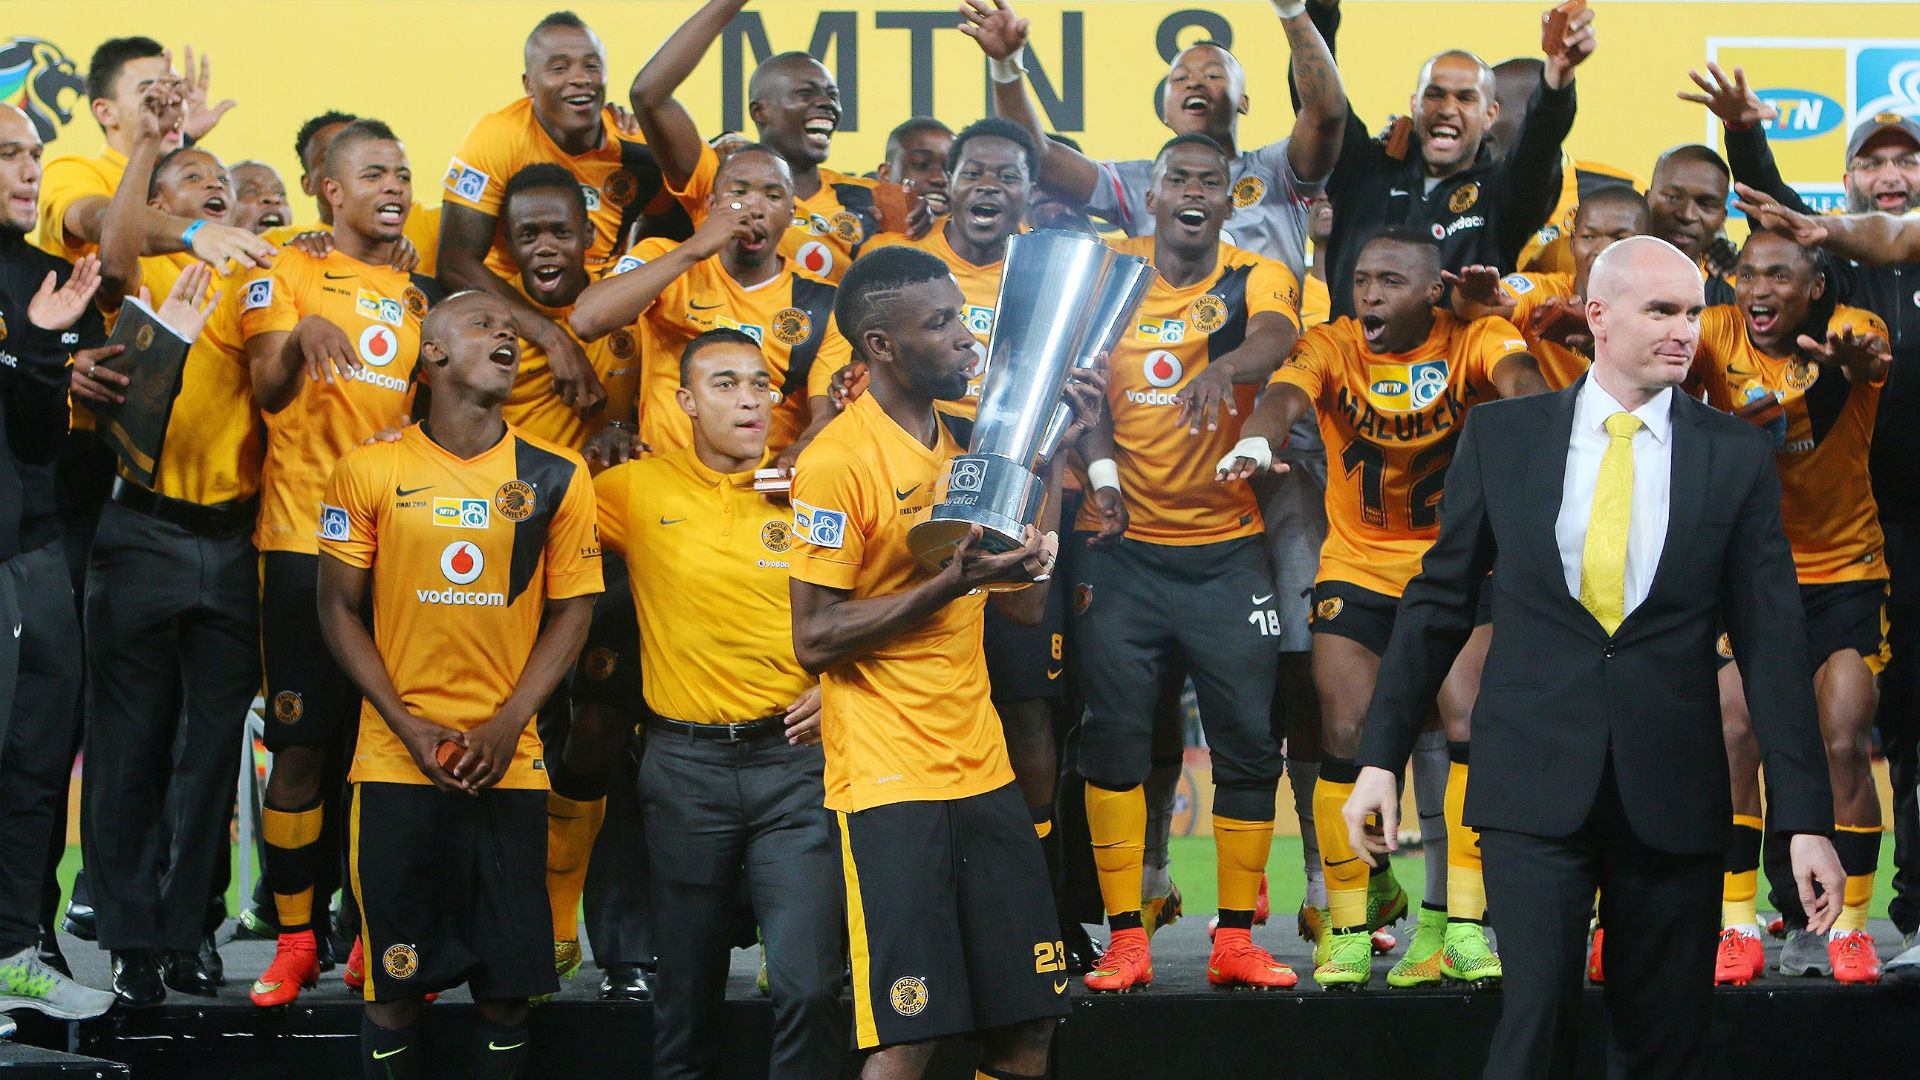 Kaizer Chiefs Fc: 2014 MTN8 Champions Kaizer Chiefs